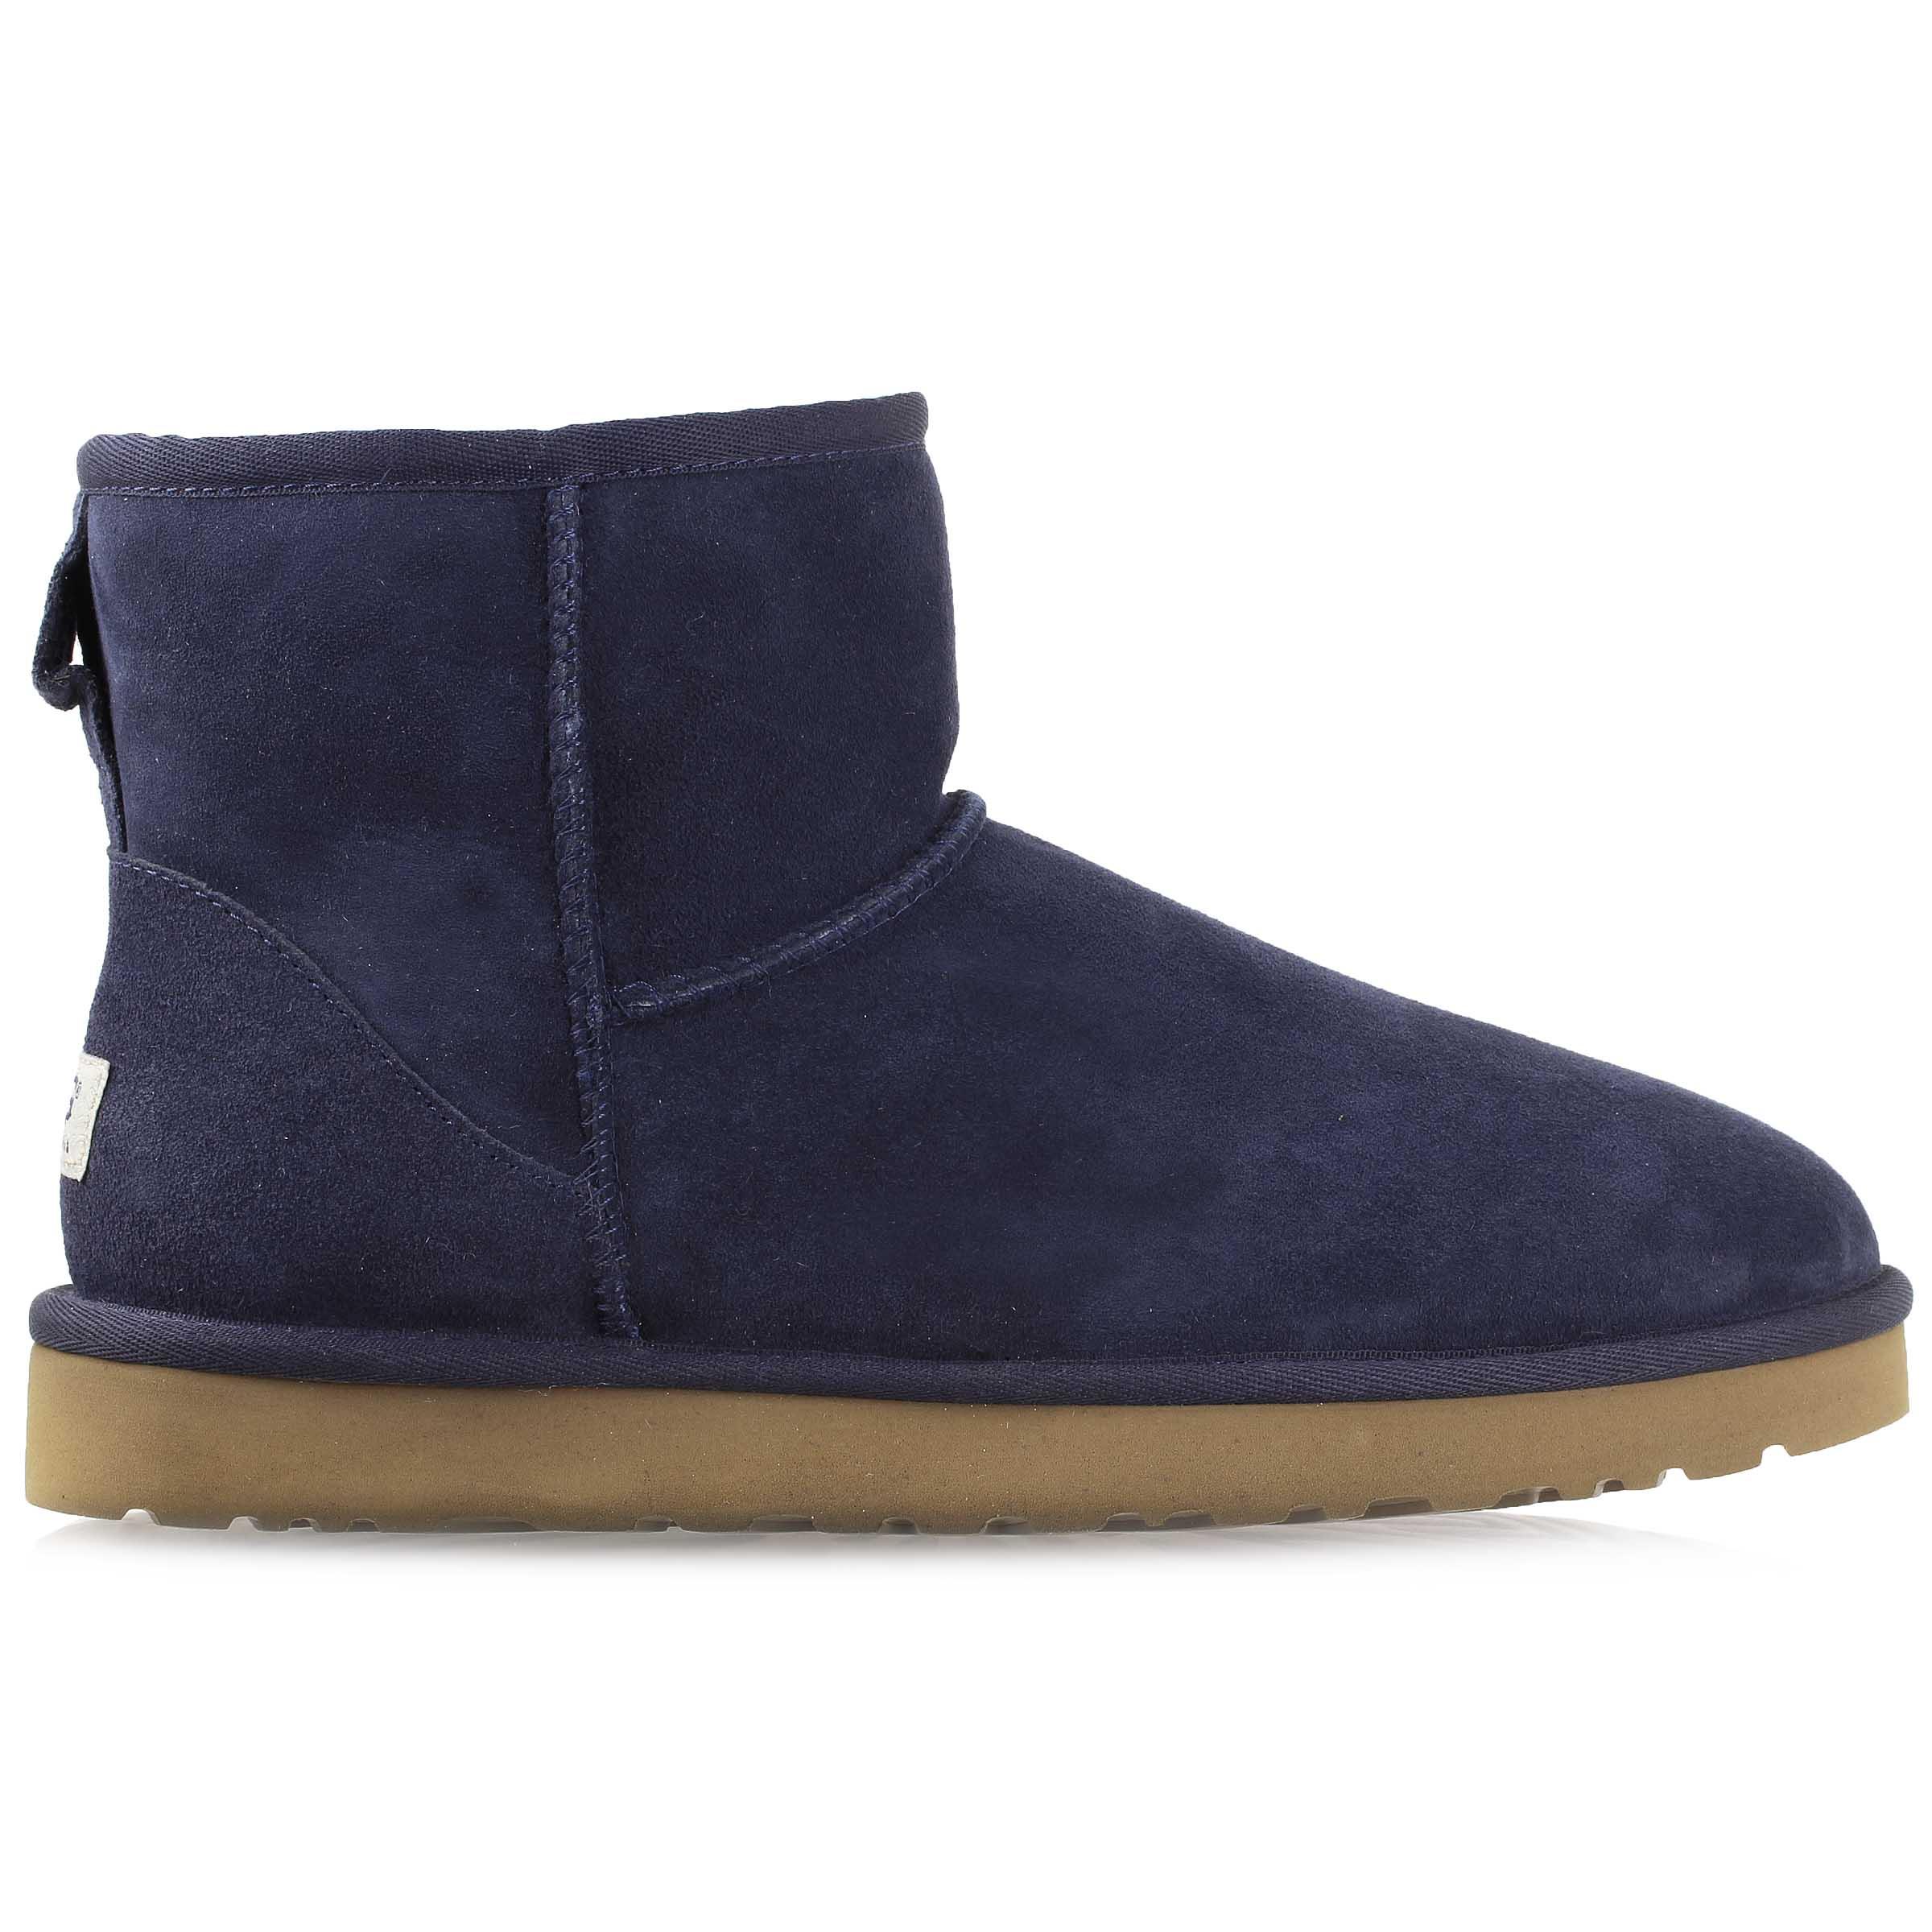 UGG Australia Women\'s Classic Mini Sheepskin Boot Shoes 5854 W-NVY ...